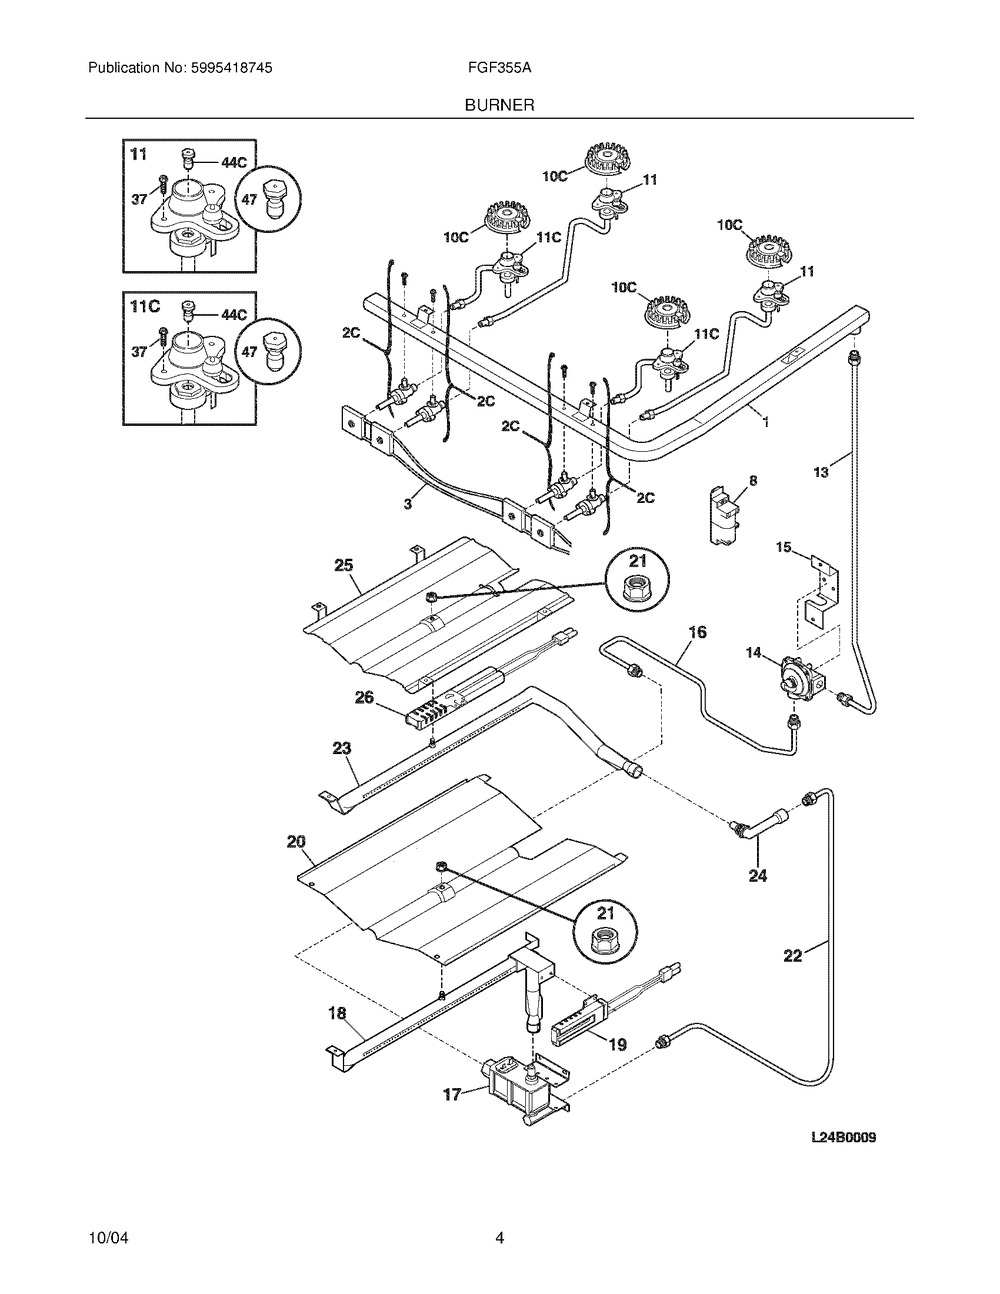 Diagram for FGF355ASH